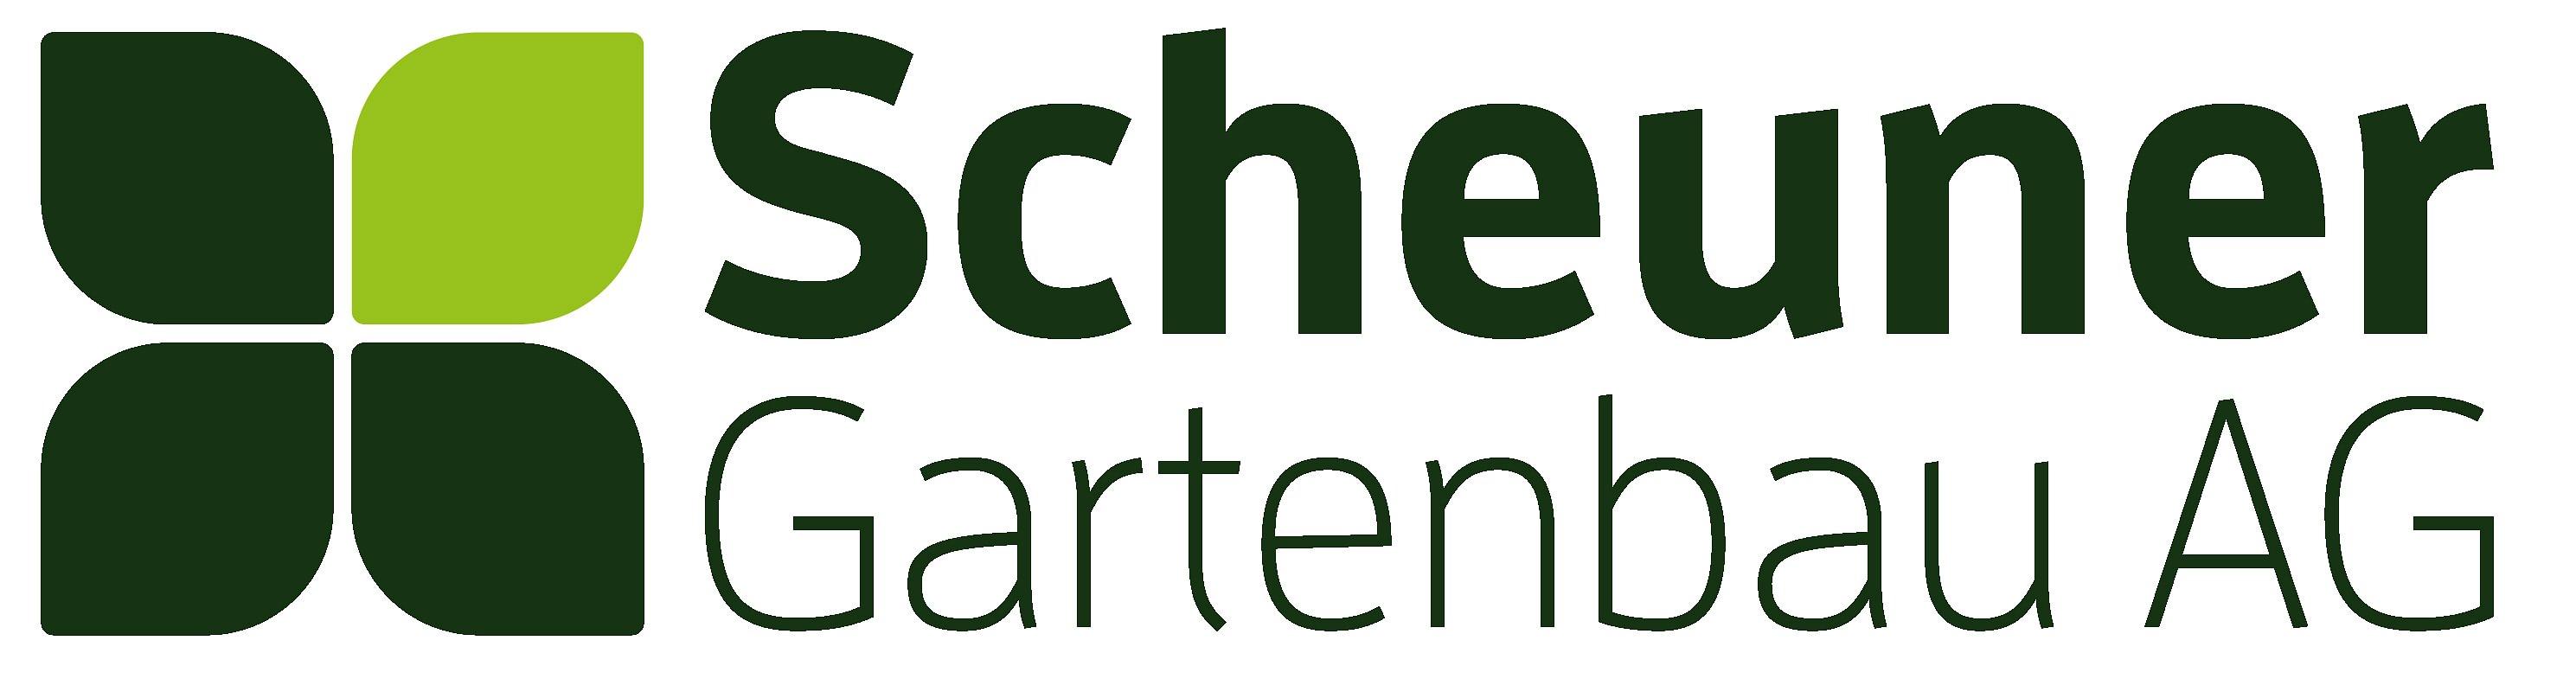 Scheuner Gartenbau AG